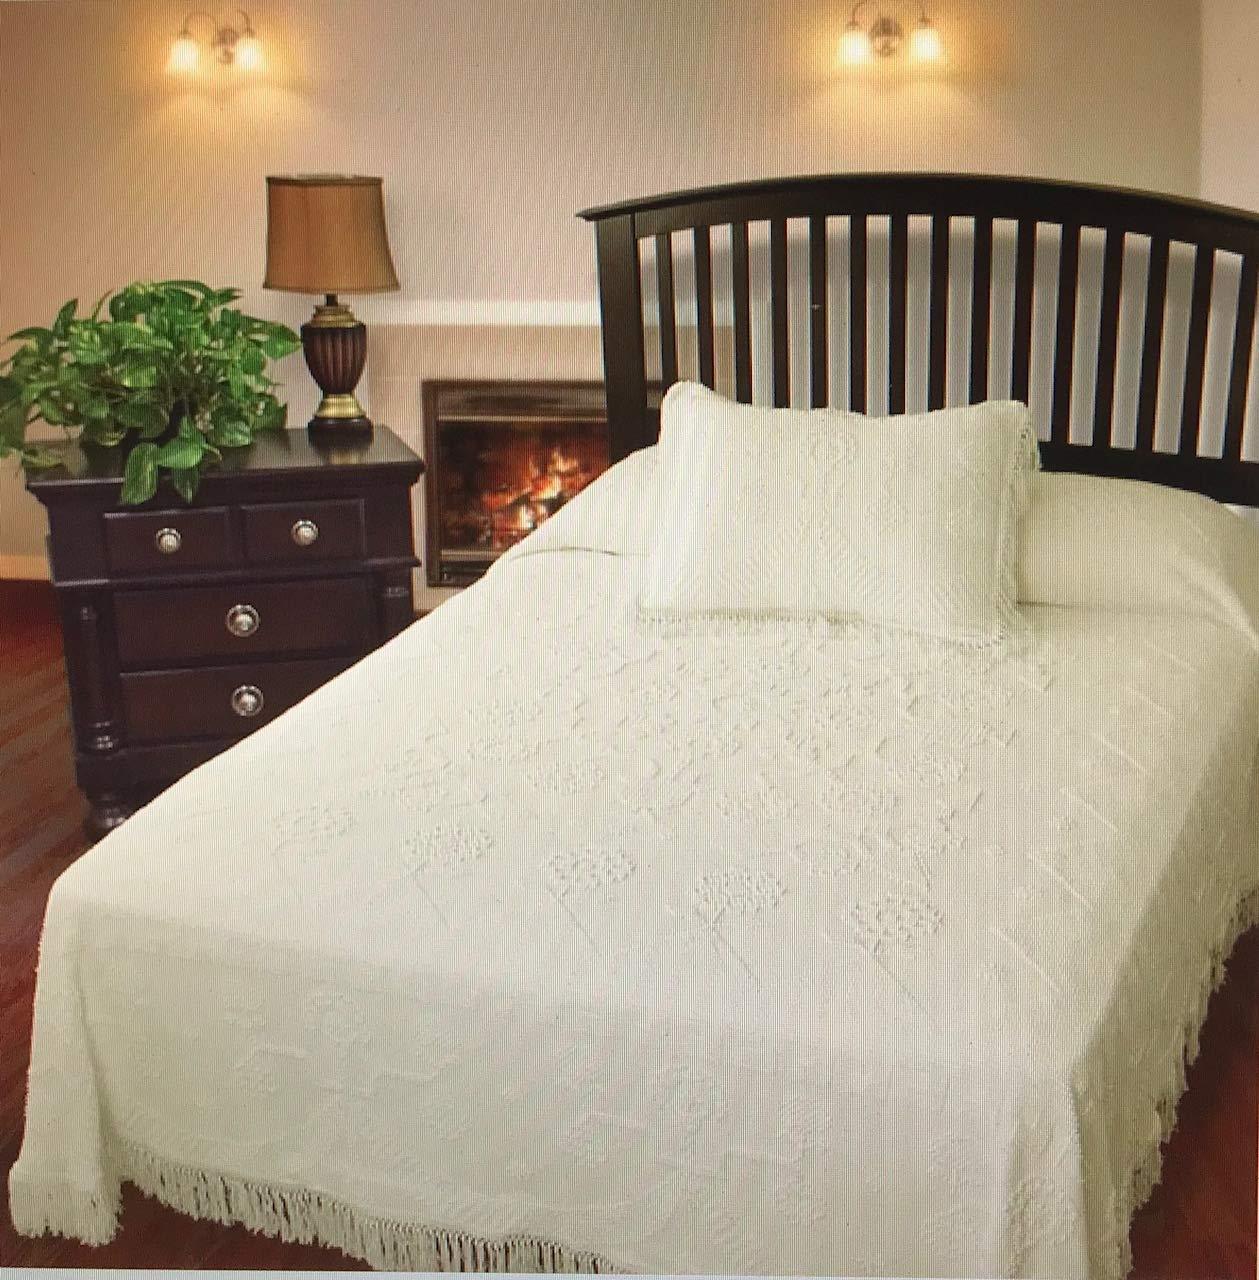 Antique Twin Martha Washington's Choice Bedspread - Twin - White - with String Fringe